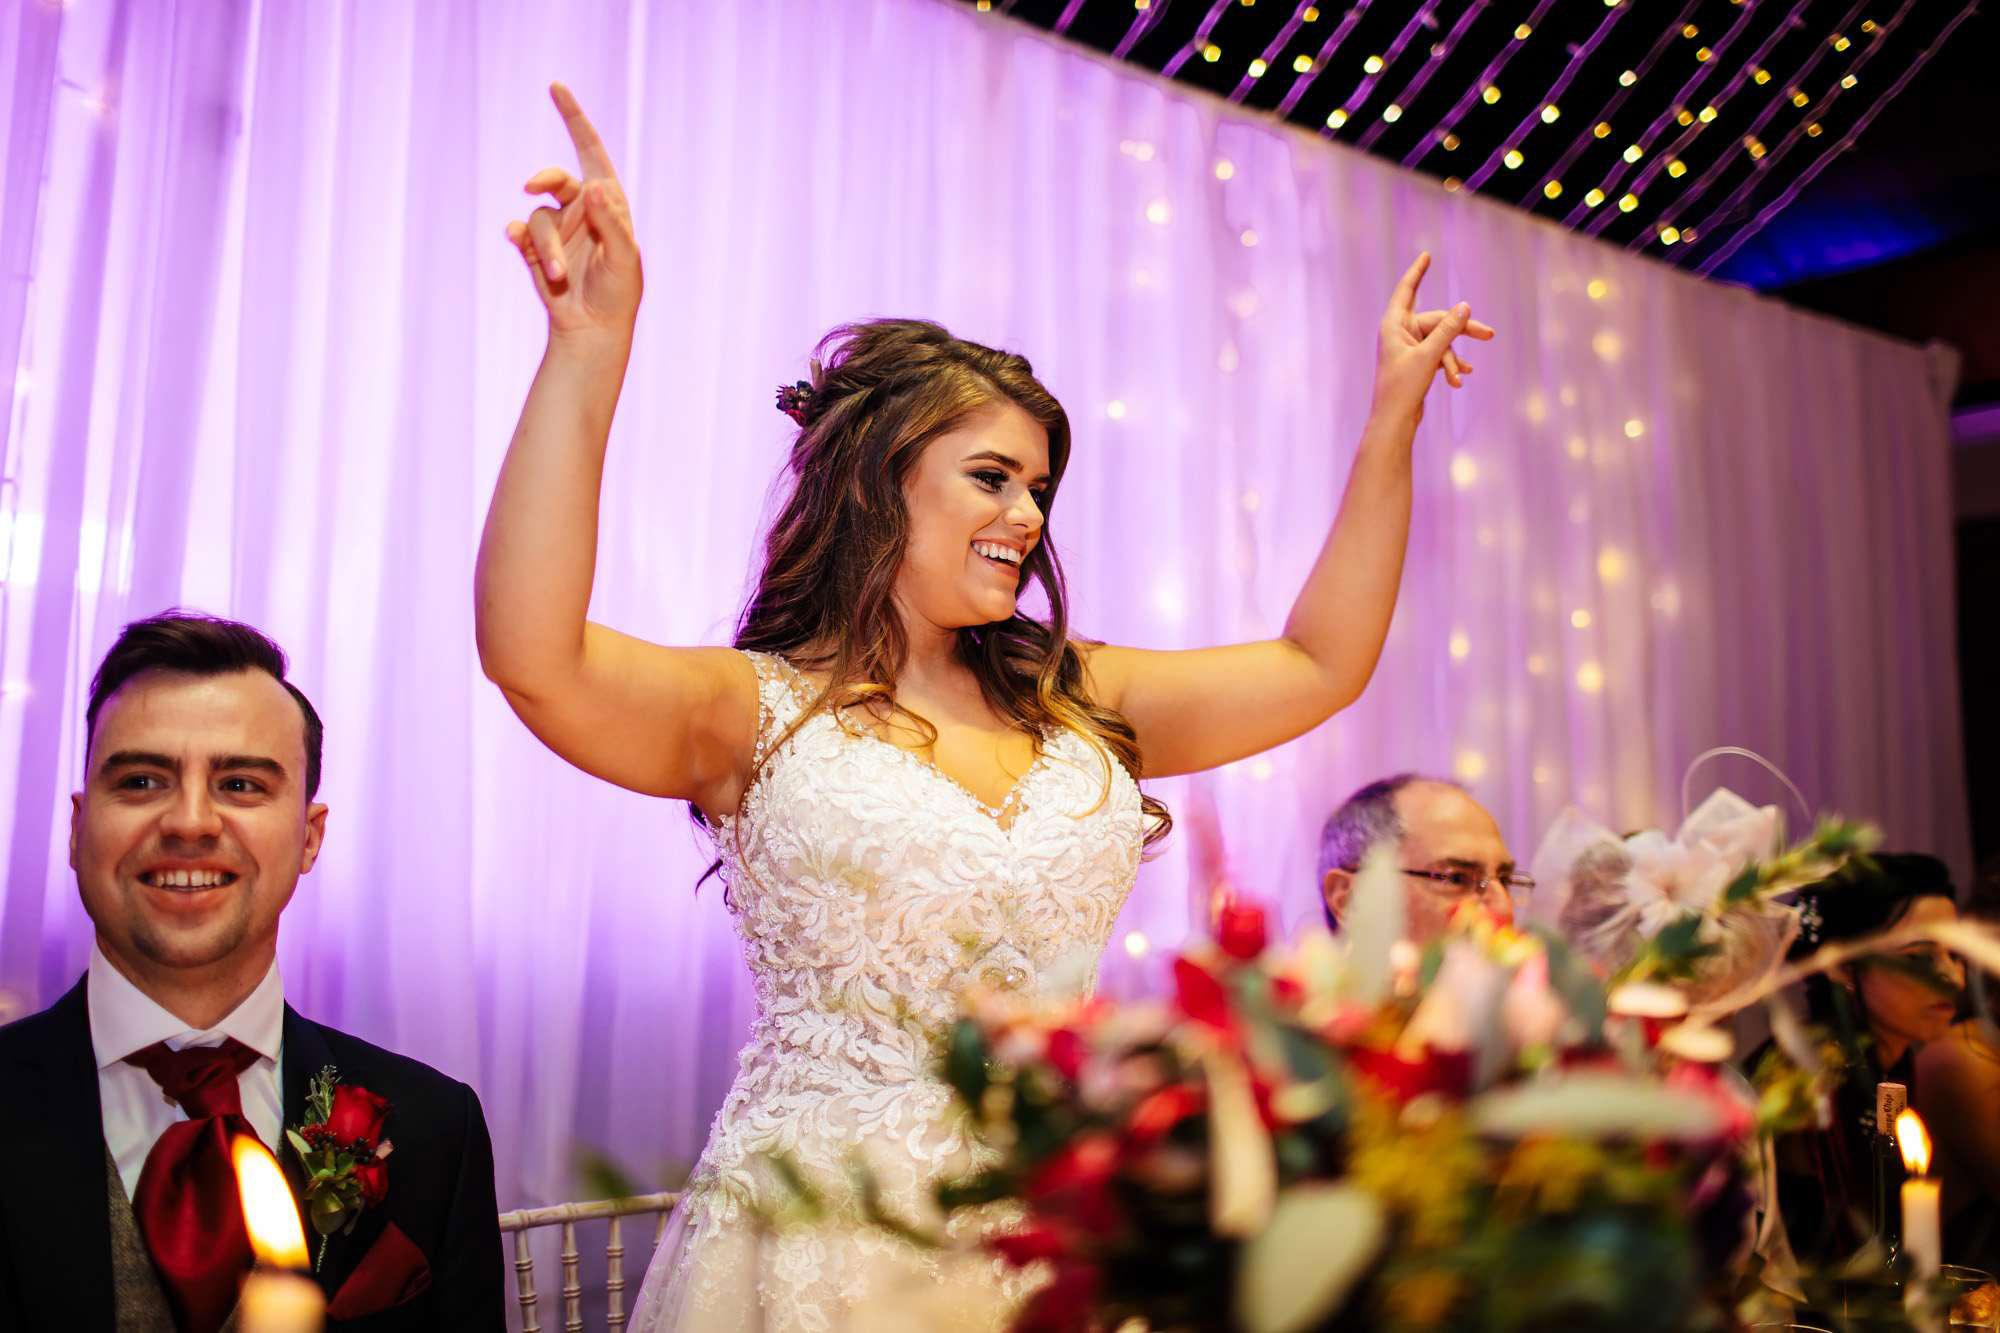 Bride dancing at her wedding in Blackpool